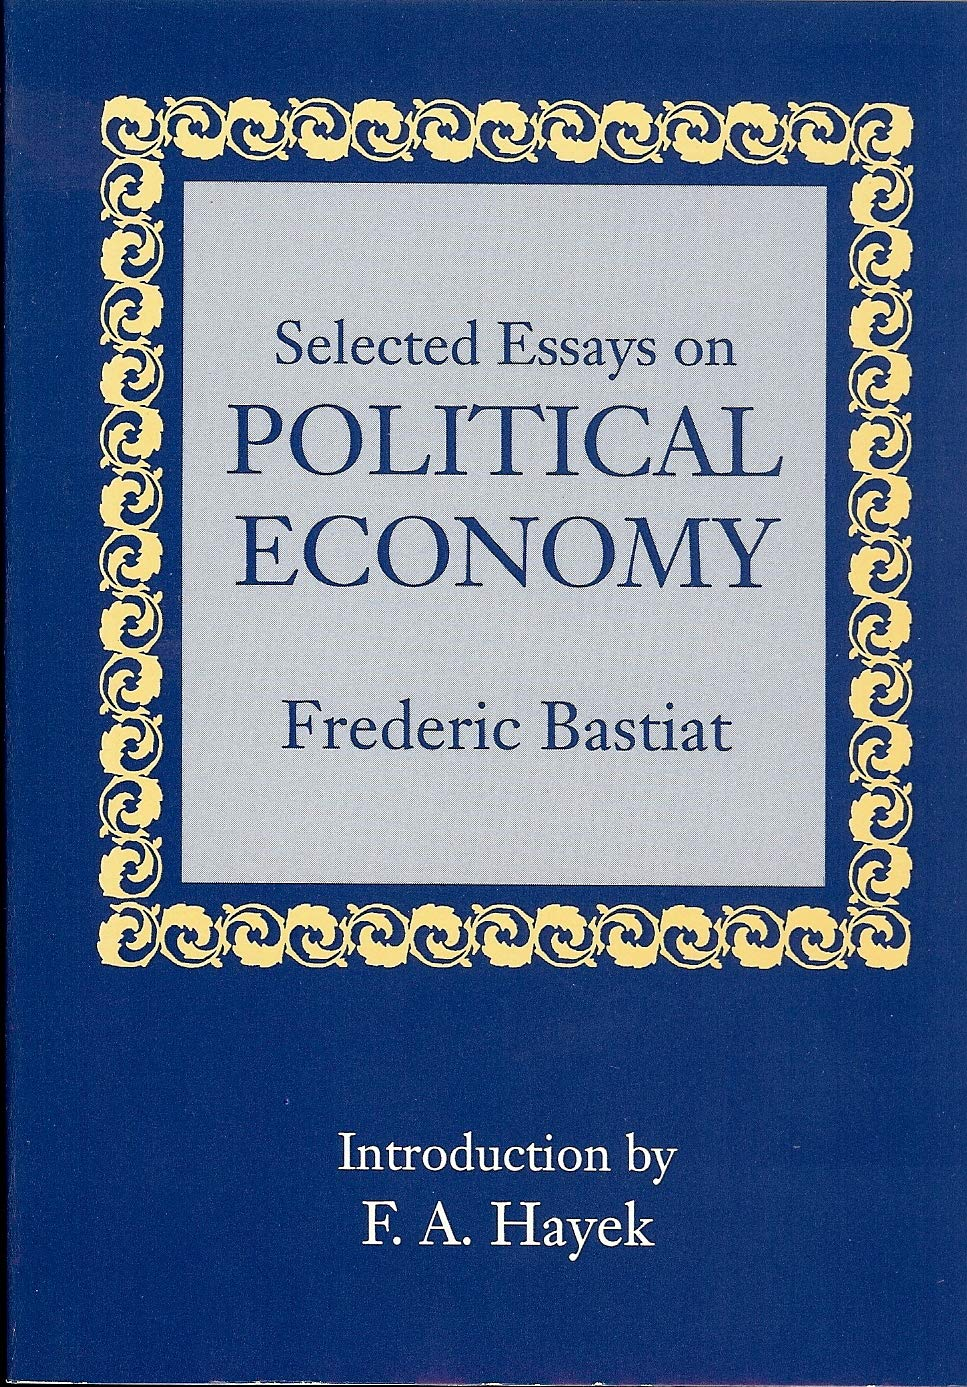 frederic bastiat selected essays on political economy